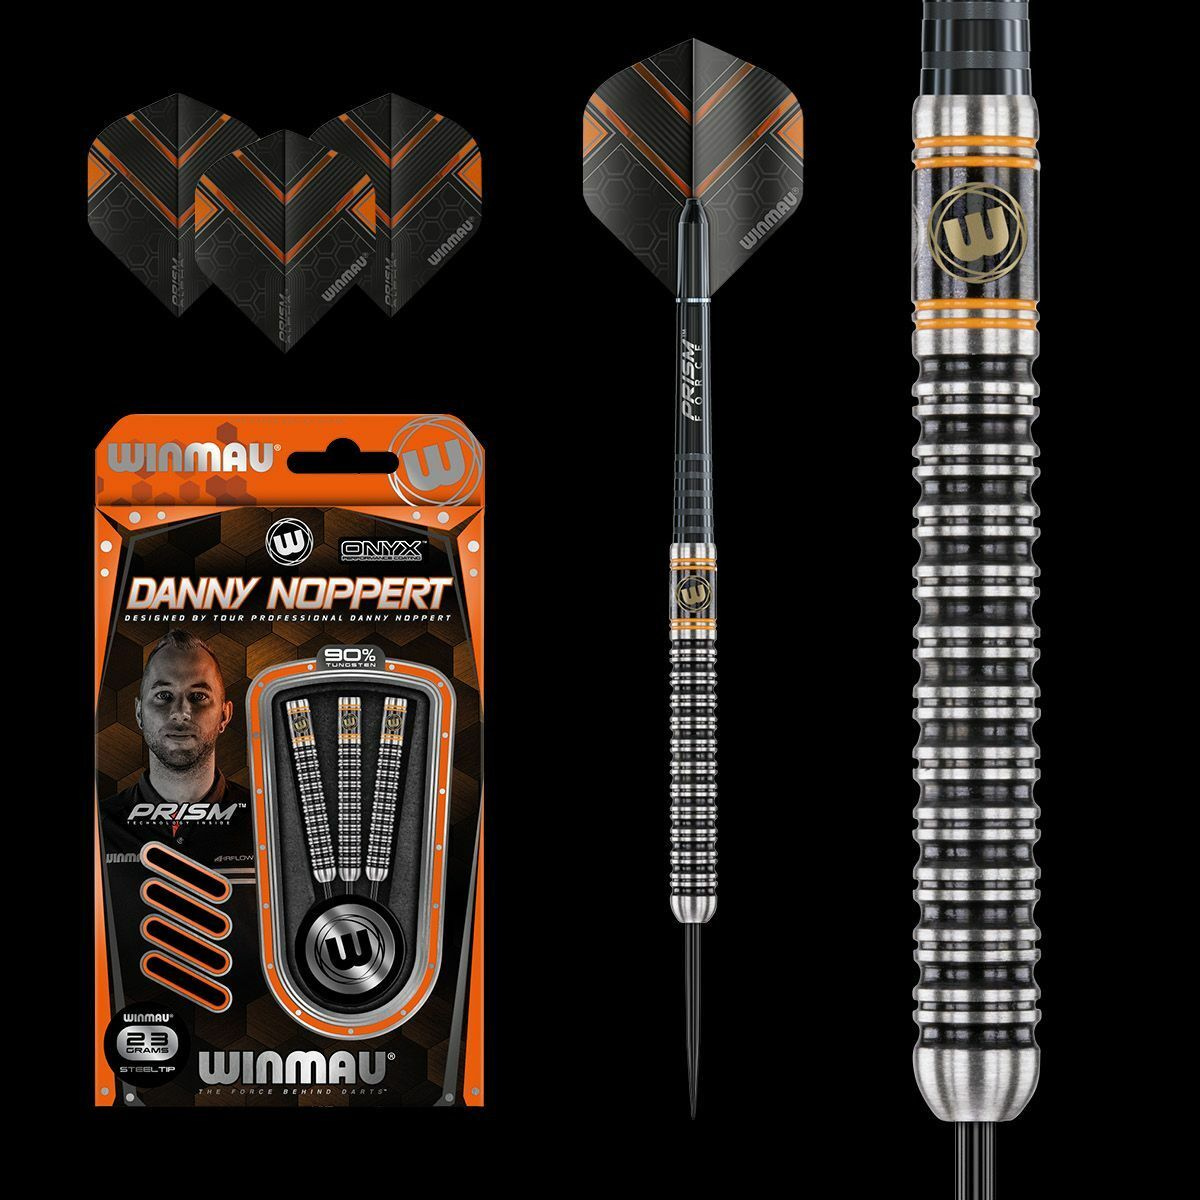 Winmau Danny Noppert 23g Onyx 90% Tungsten Darts Set